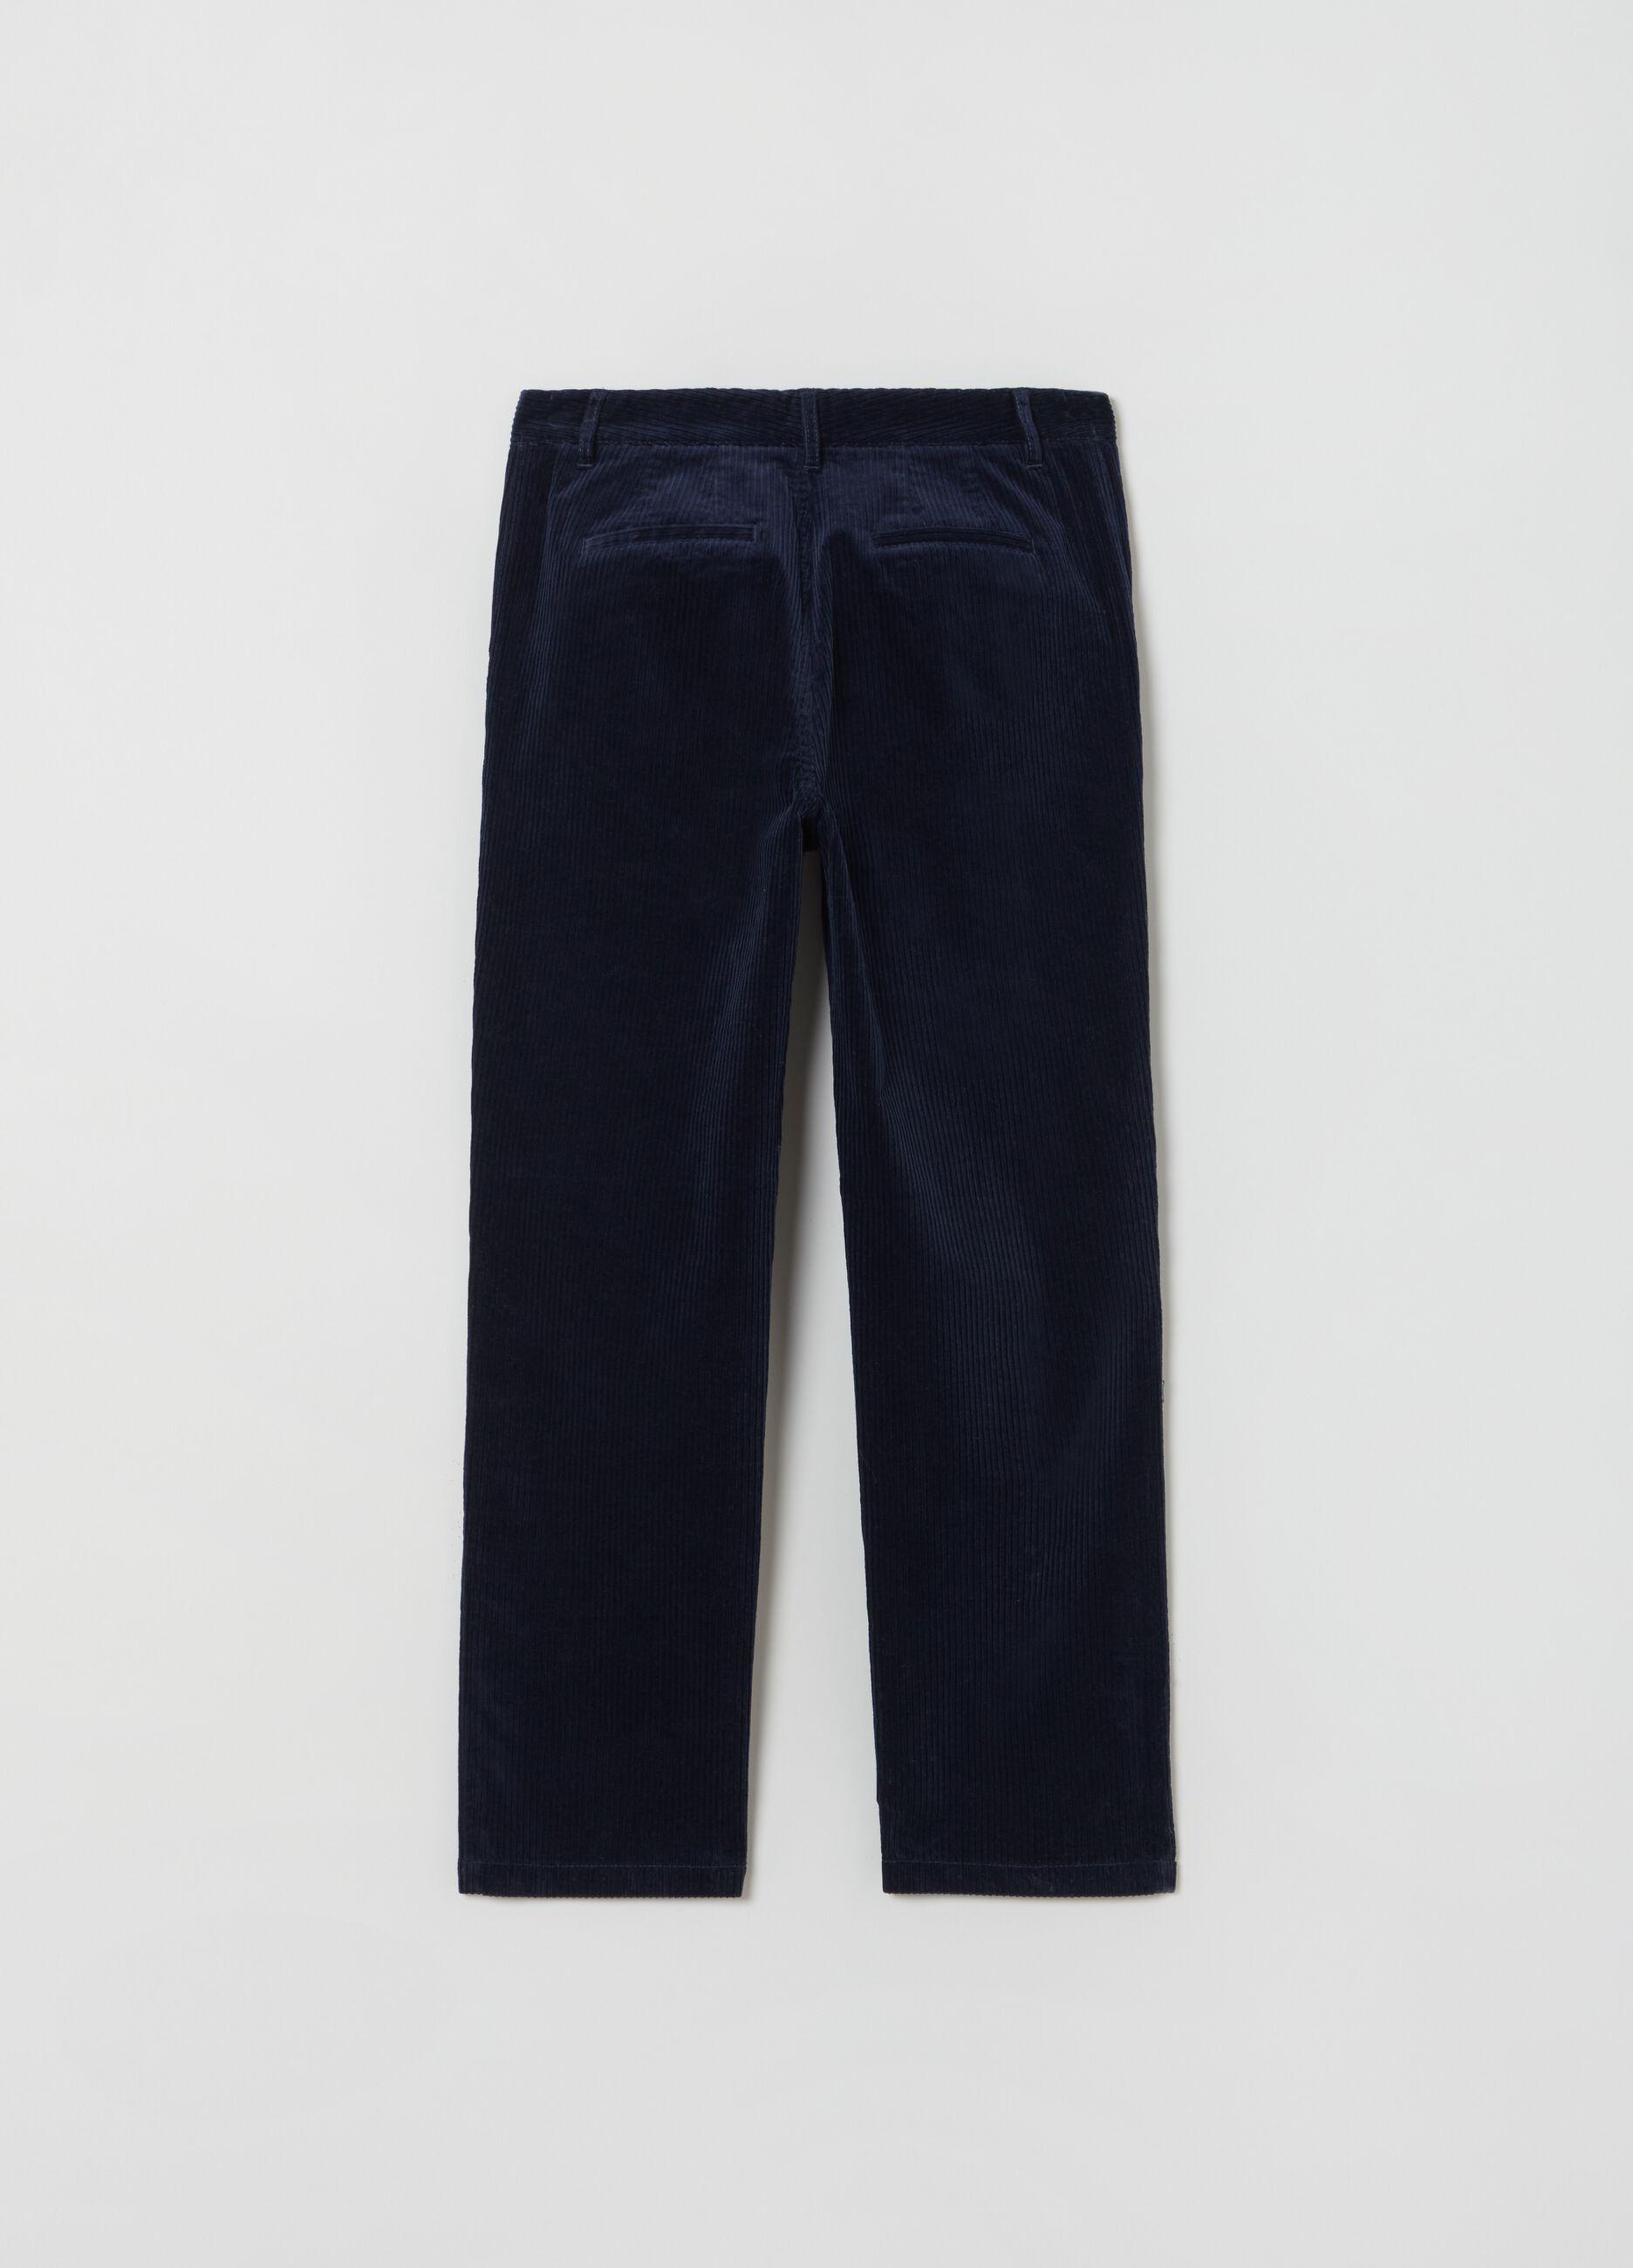 Pantalone chino in corduroy Blu